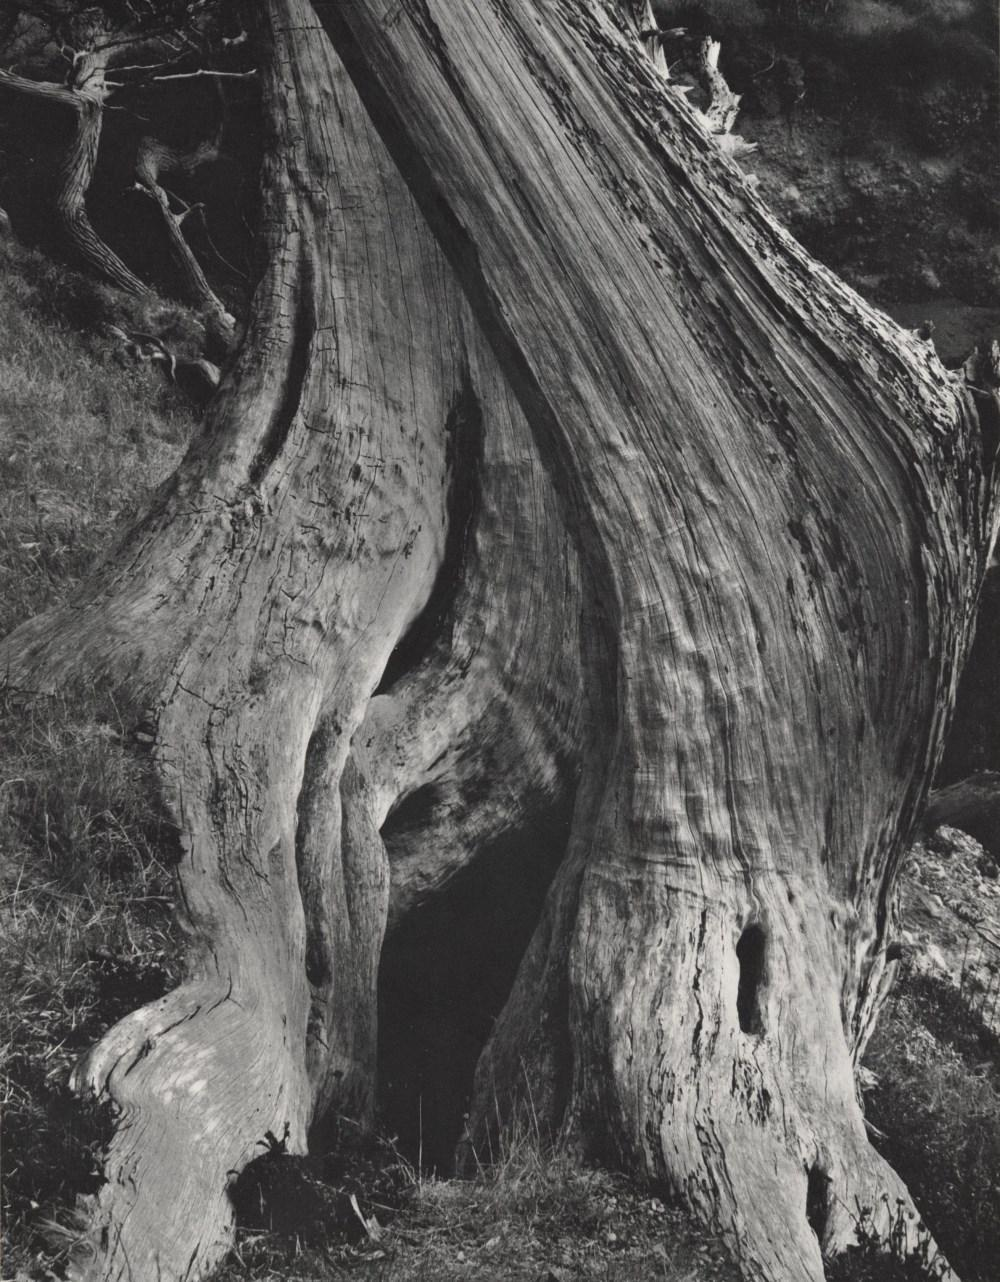 Edward Weston - Cypress, Point Lobos For Sale at 1stDibs